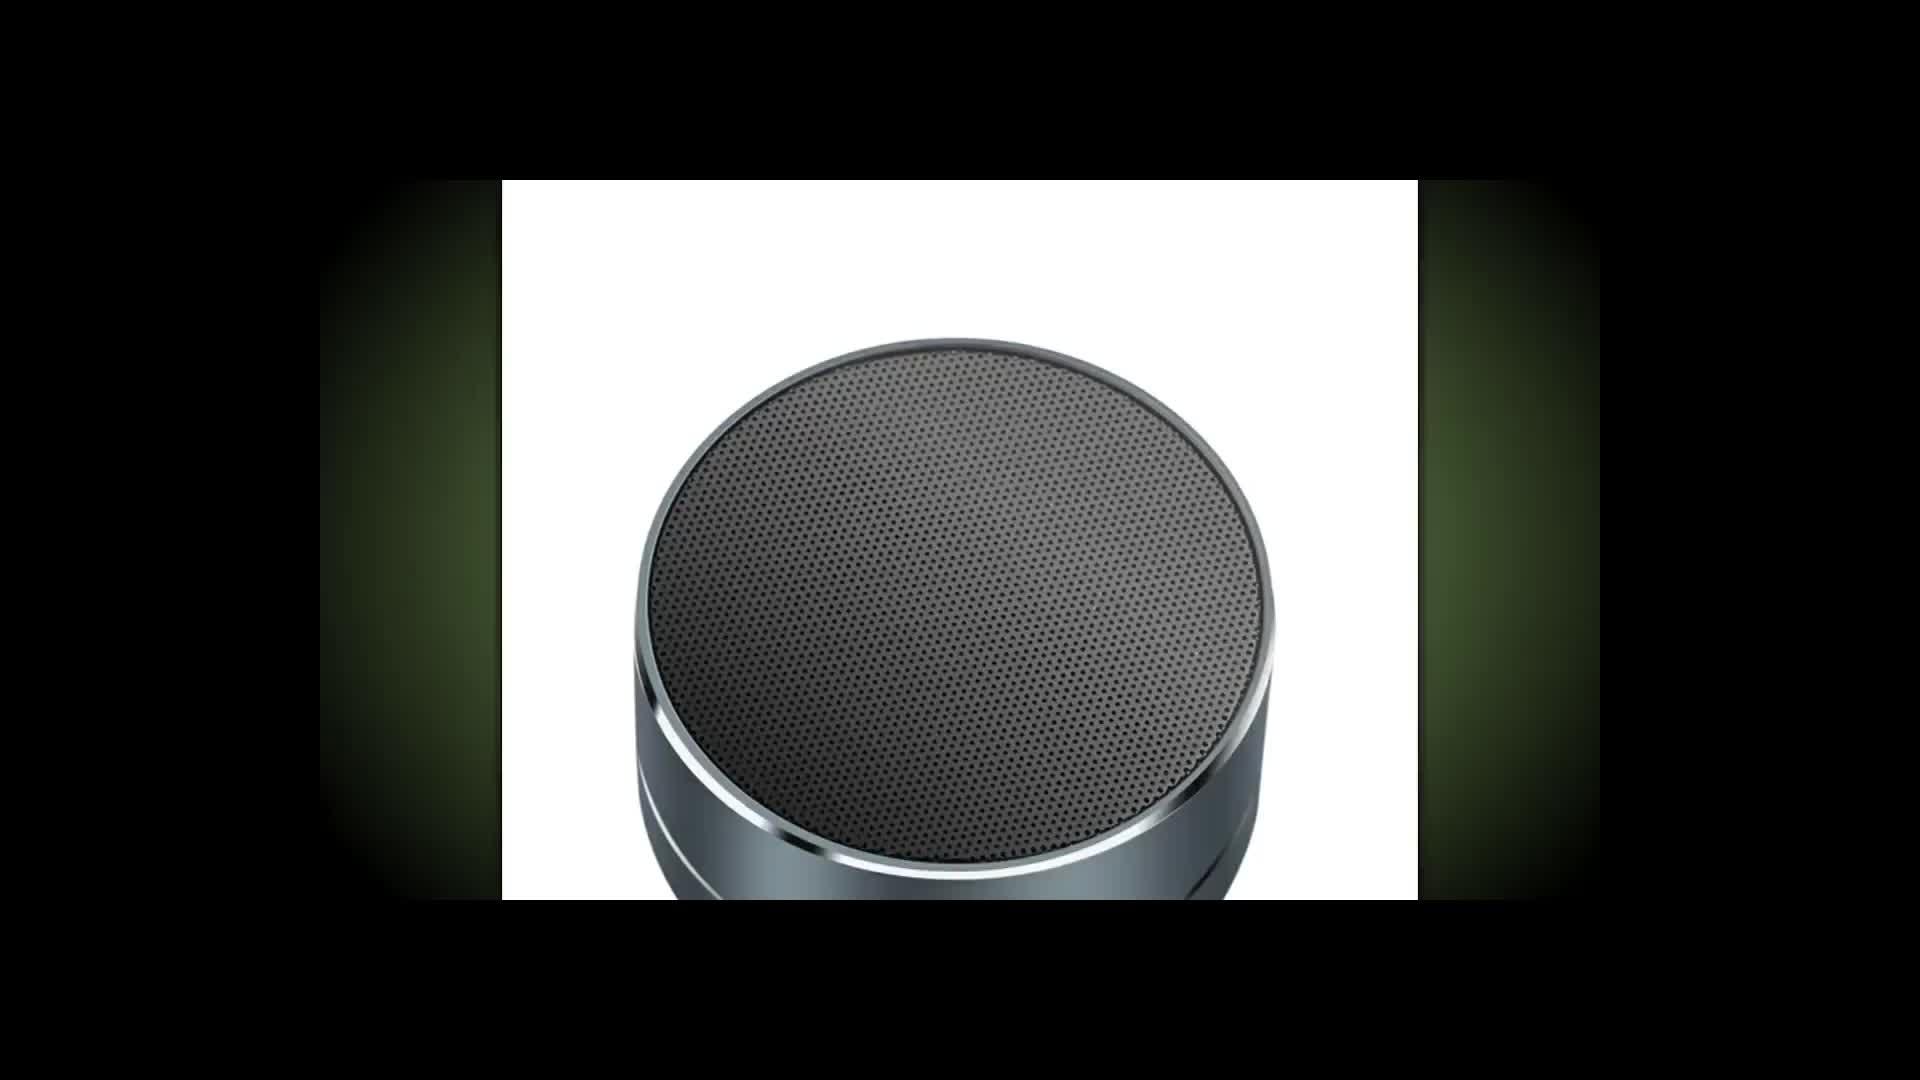 Mgitec A10 music dj sound box wireless speaker, creative speaker volume control, led metal steel mini portable speaker A10